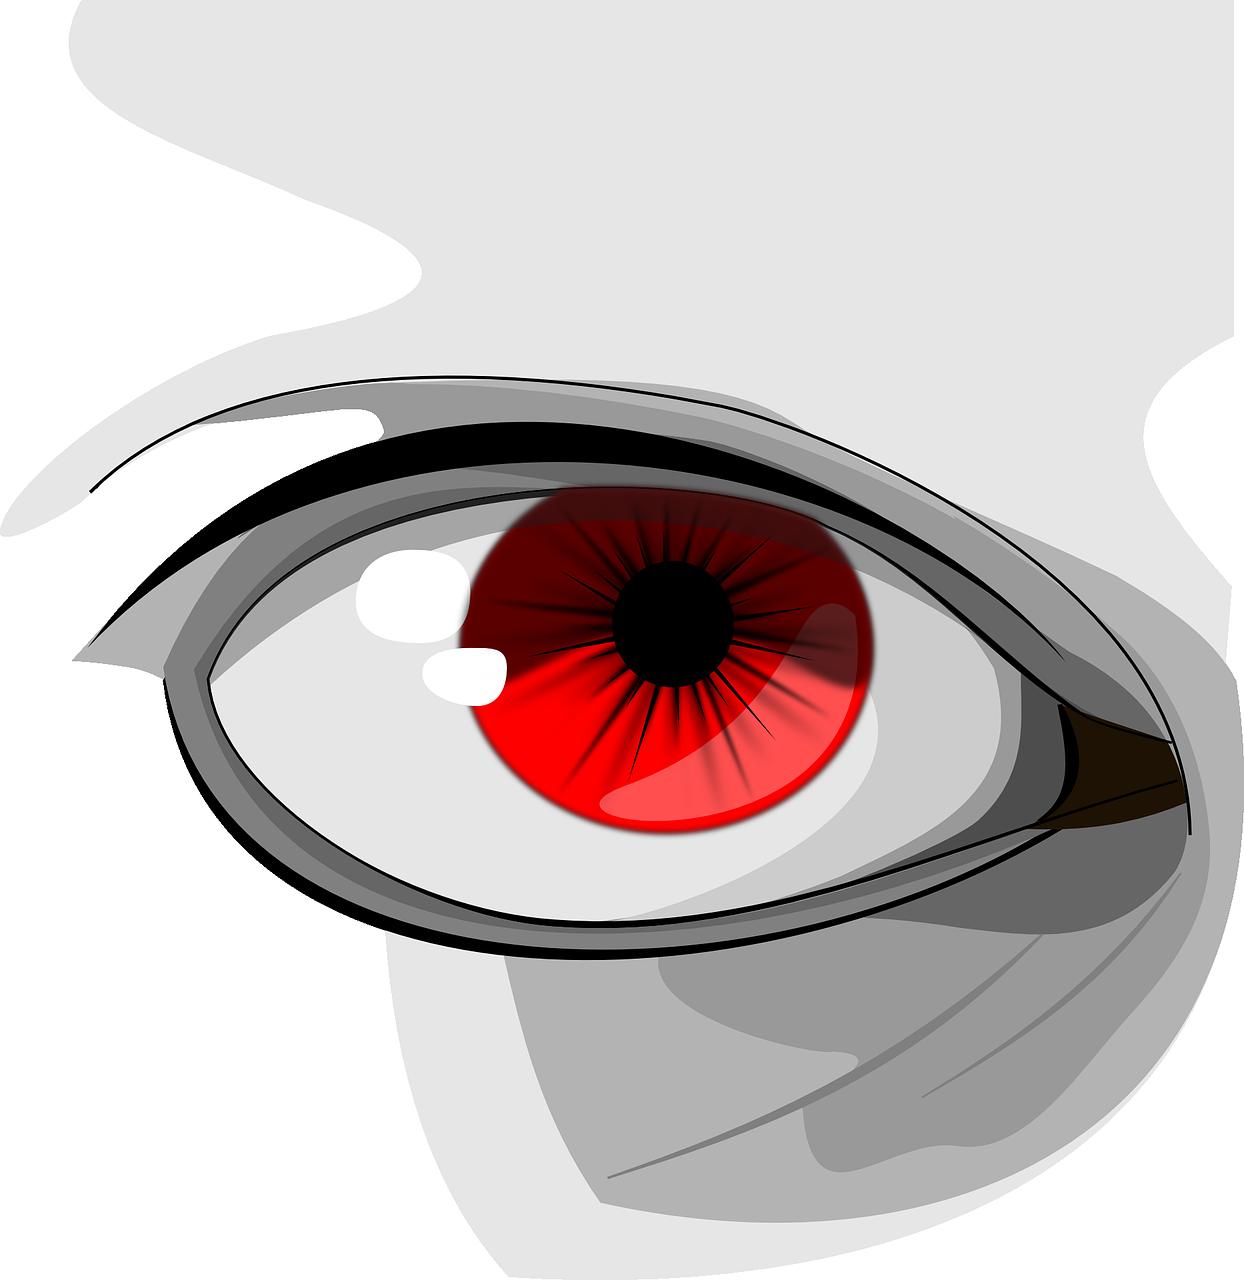 Dryeyelids net learn share. Eyelash clipart eyelid